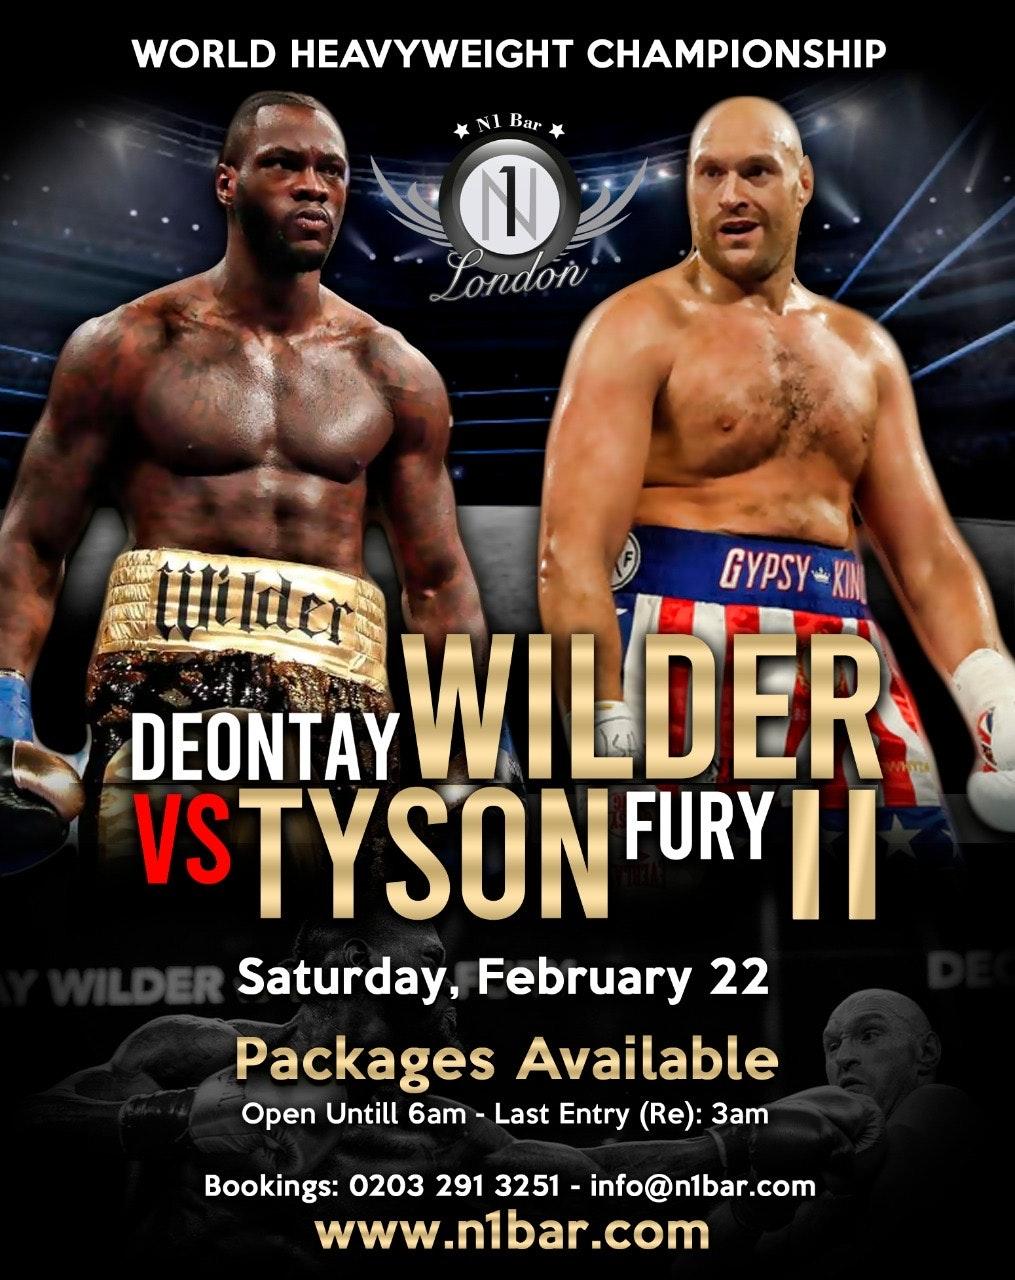 Wilder Vs Fury 2 (Fight Screening & Party)